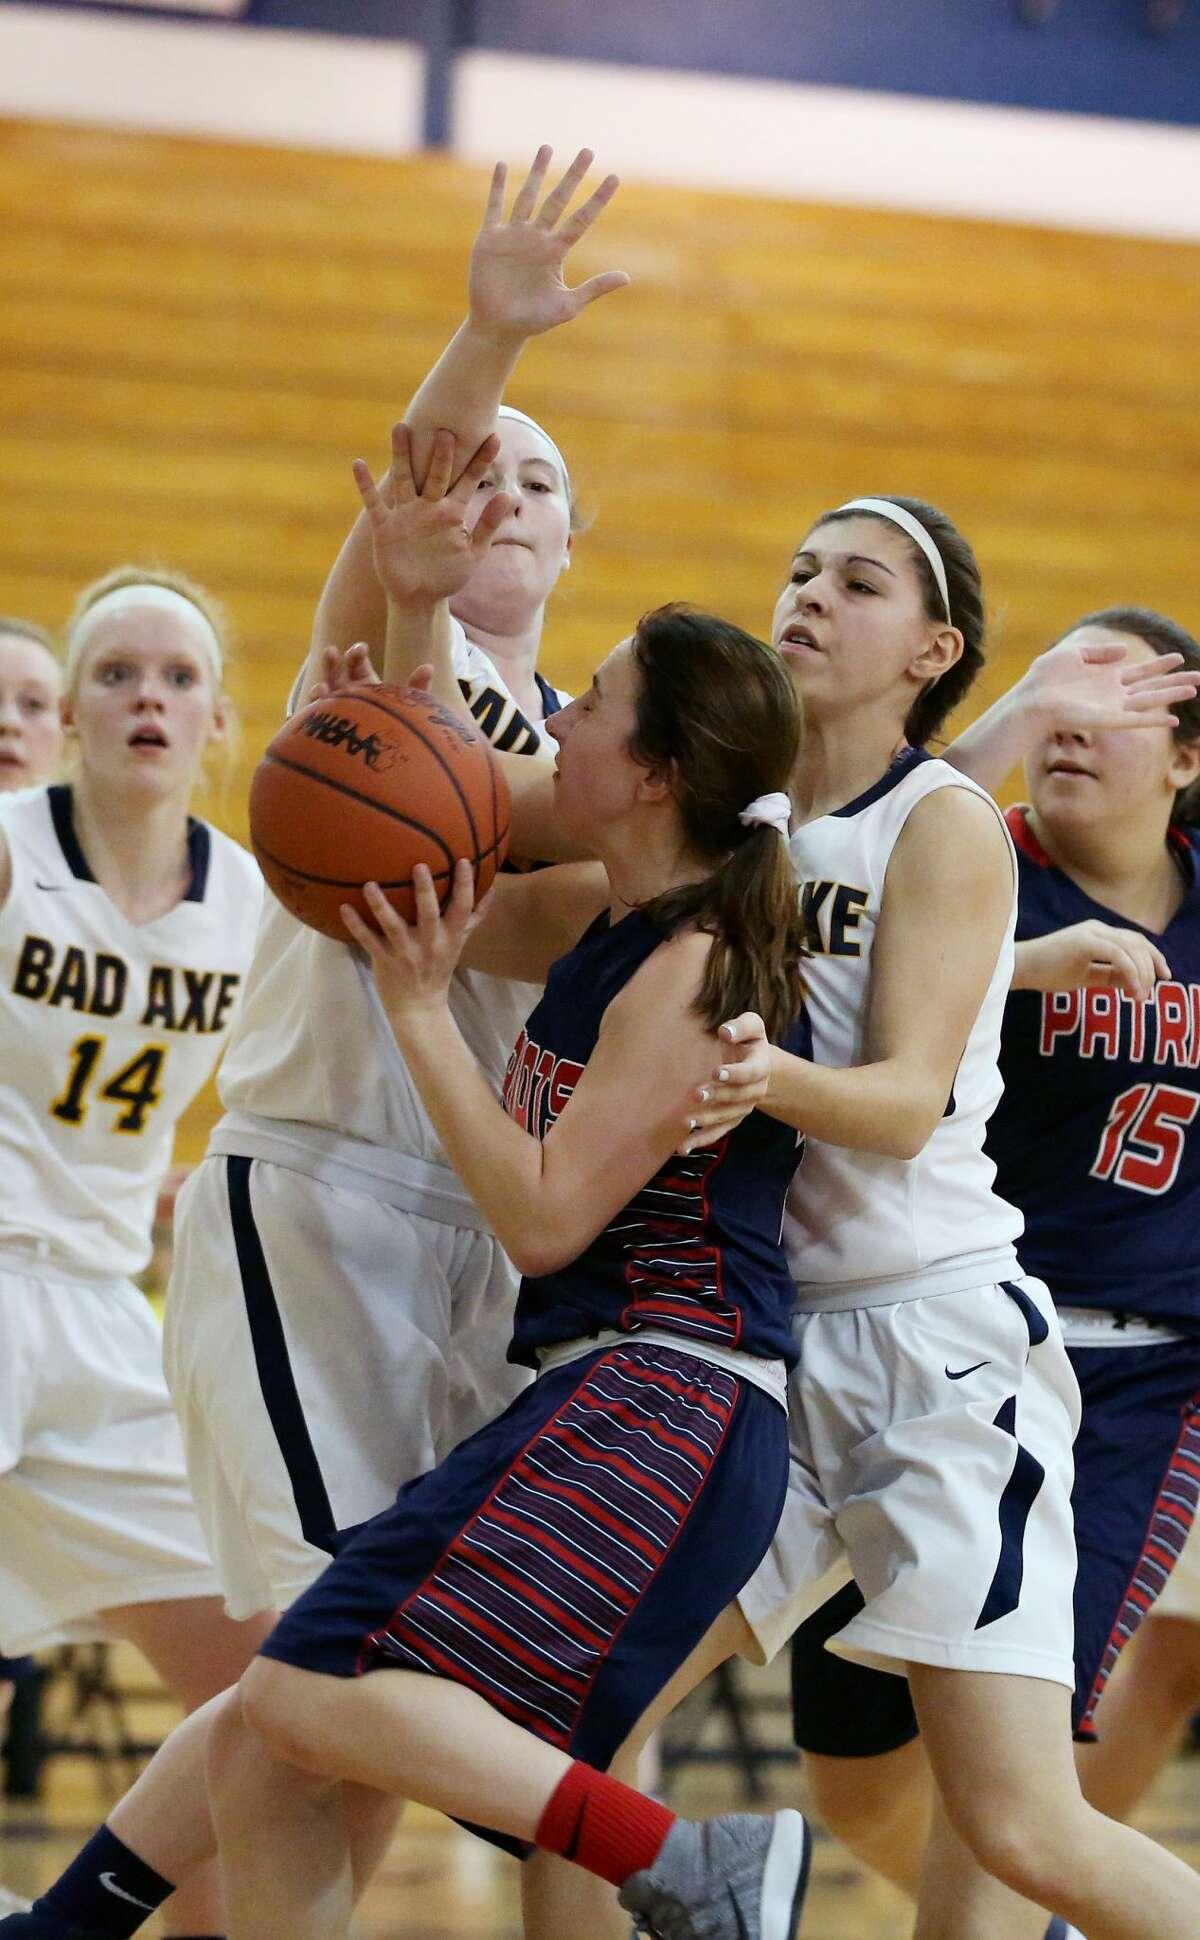 USA at Bad Axe - Girls Basketball 2018